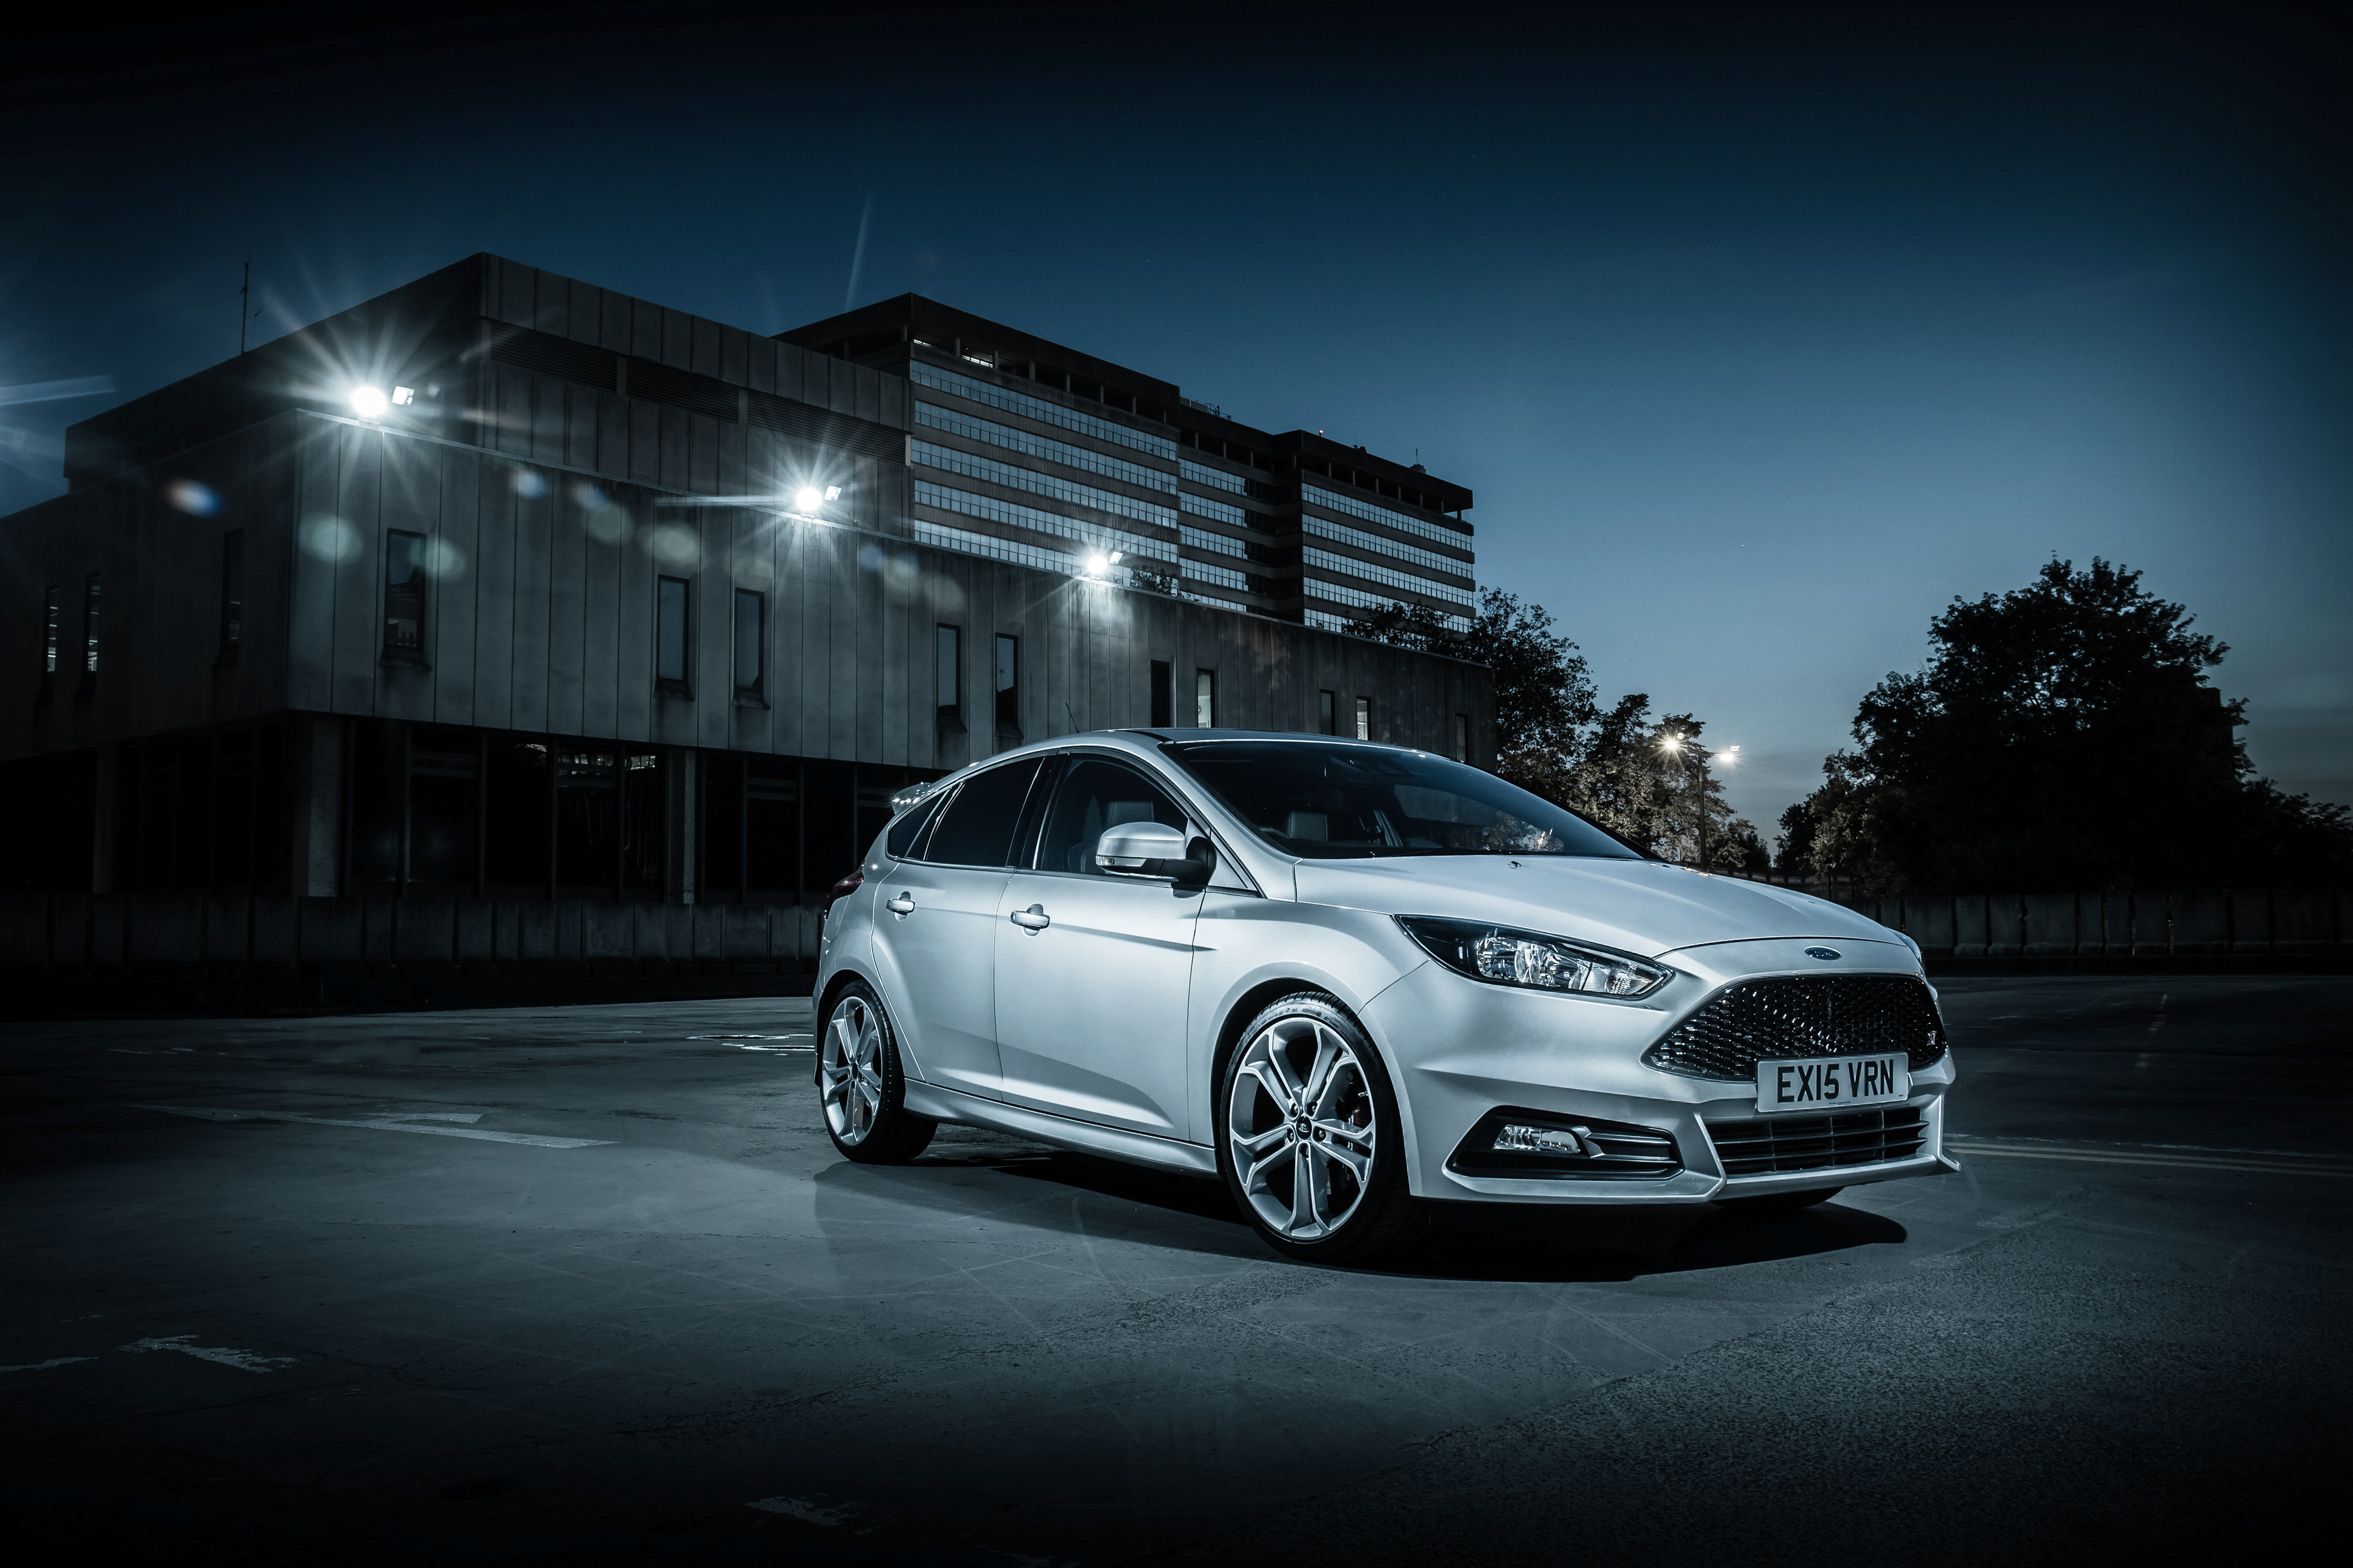 Ford Focus 4k Ultra Fondo De Pantalla Hd Fondo De